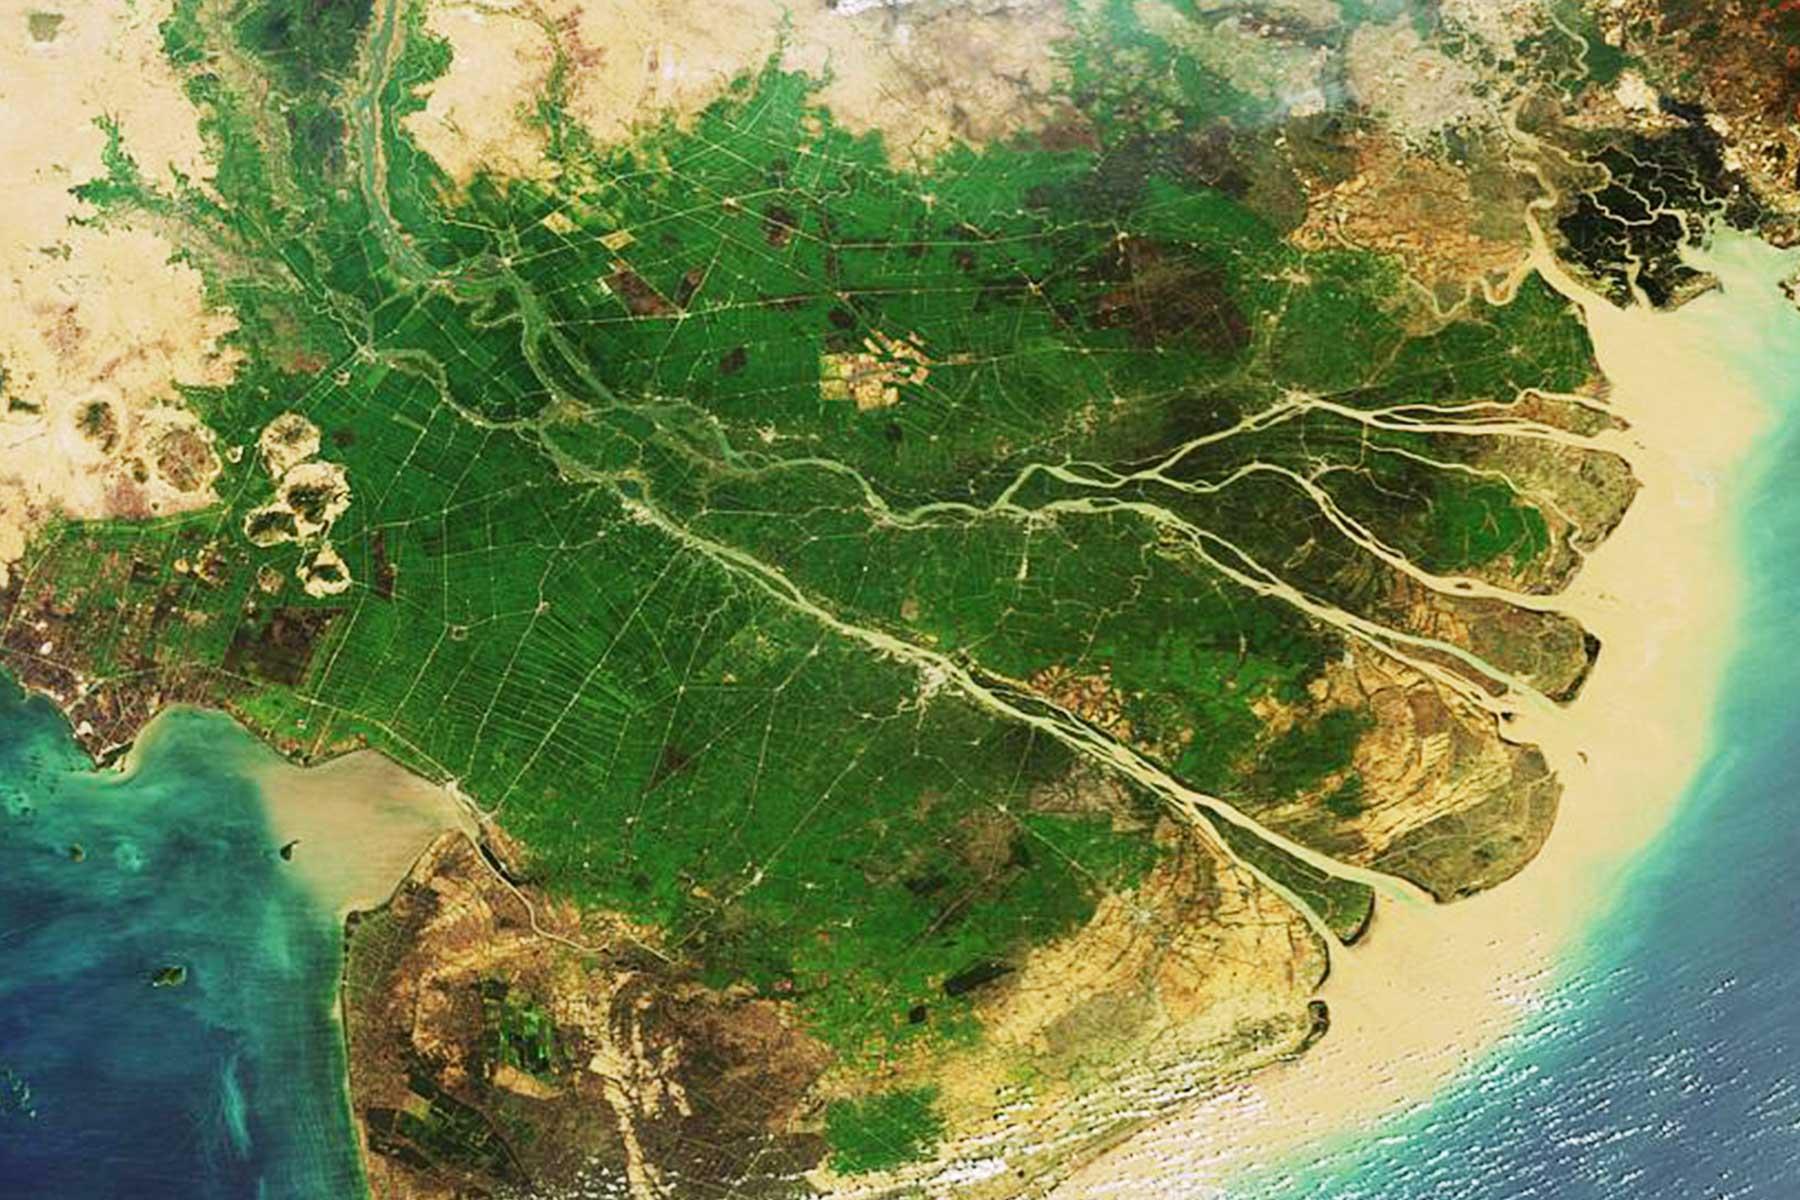 Mekong Delta Photo Journal Vietnam - Vietnam Geography Exploratory Research